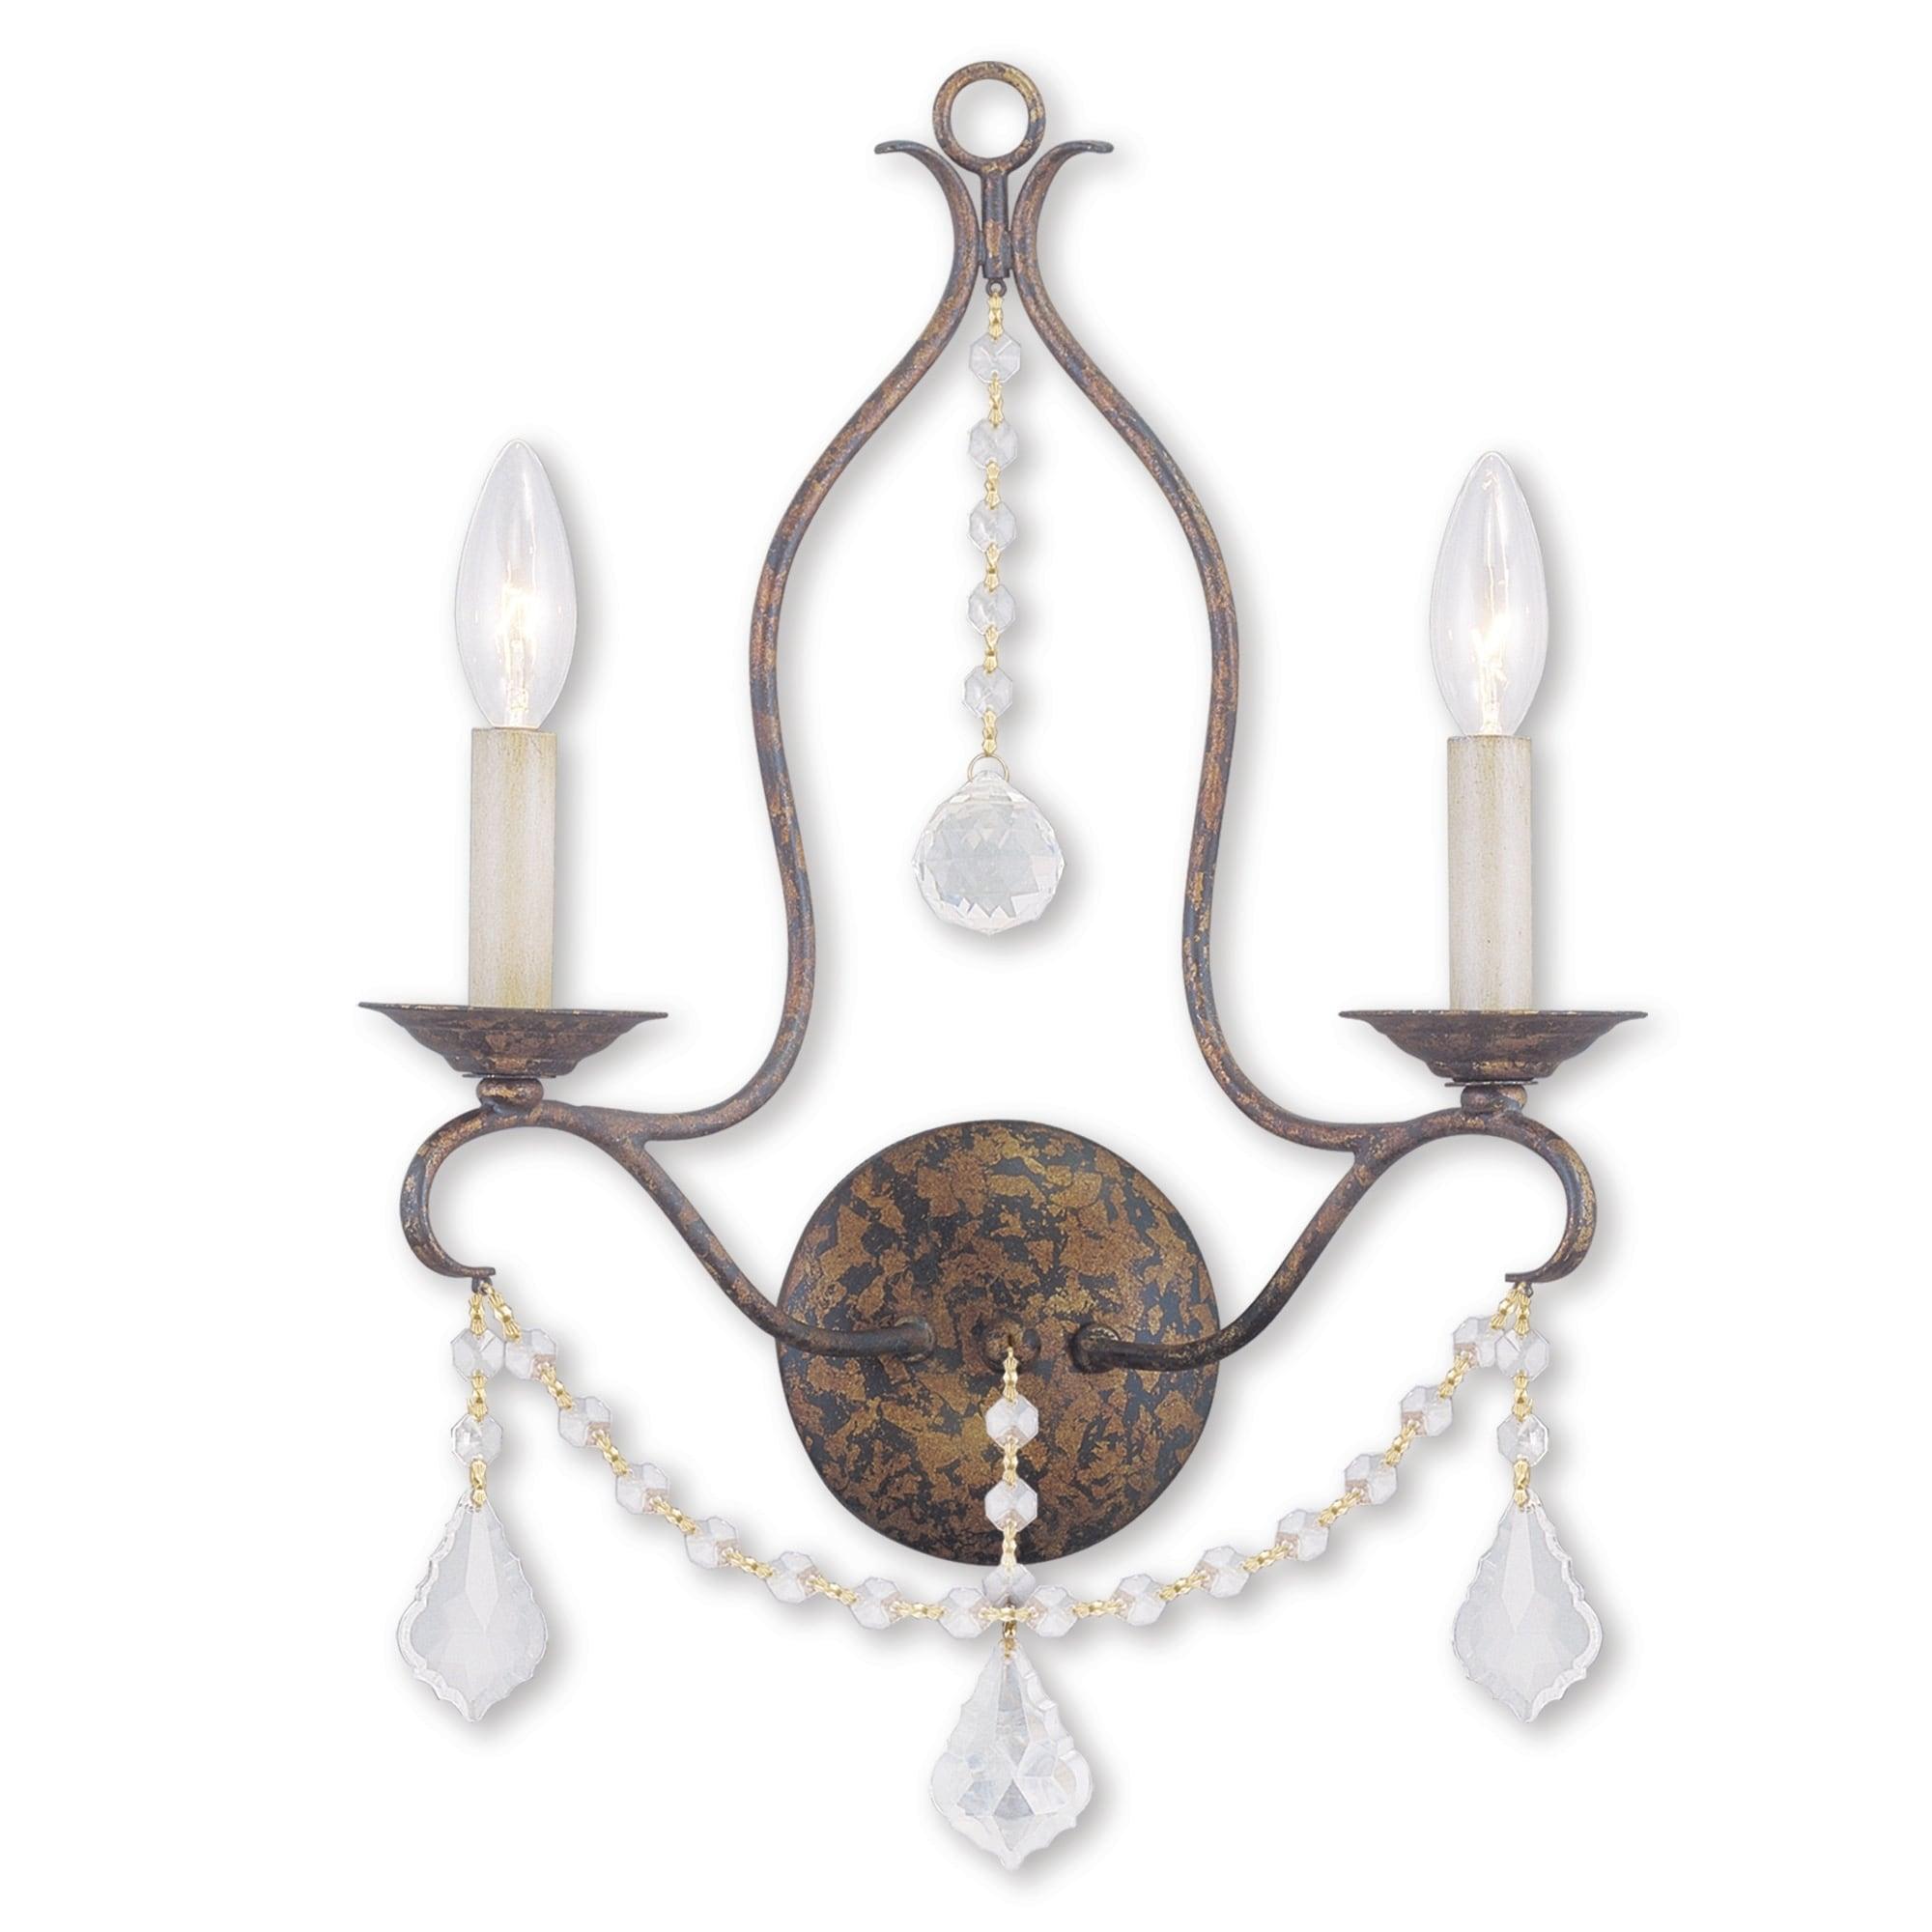 Livex Lighting Chesterfield 2 Light Hand Applied Venetian Golden Bronze Wall Sconce Overstock 25693479